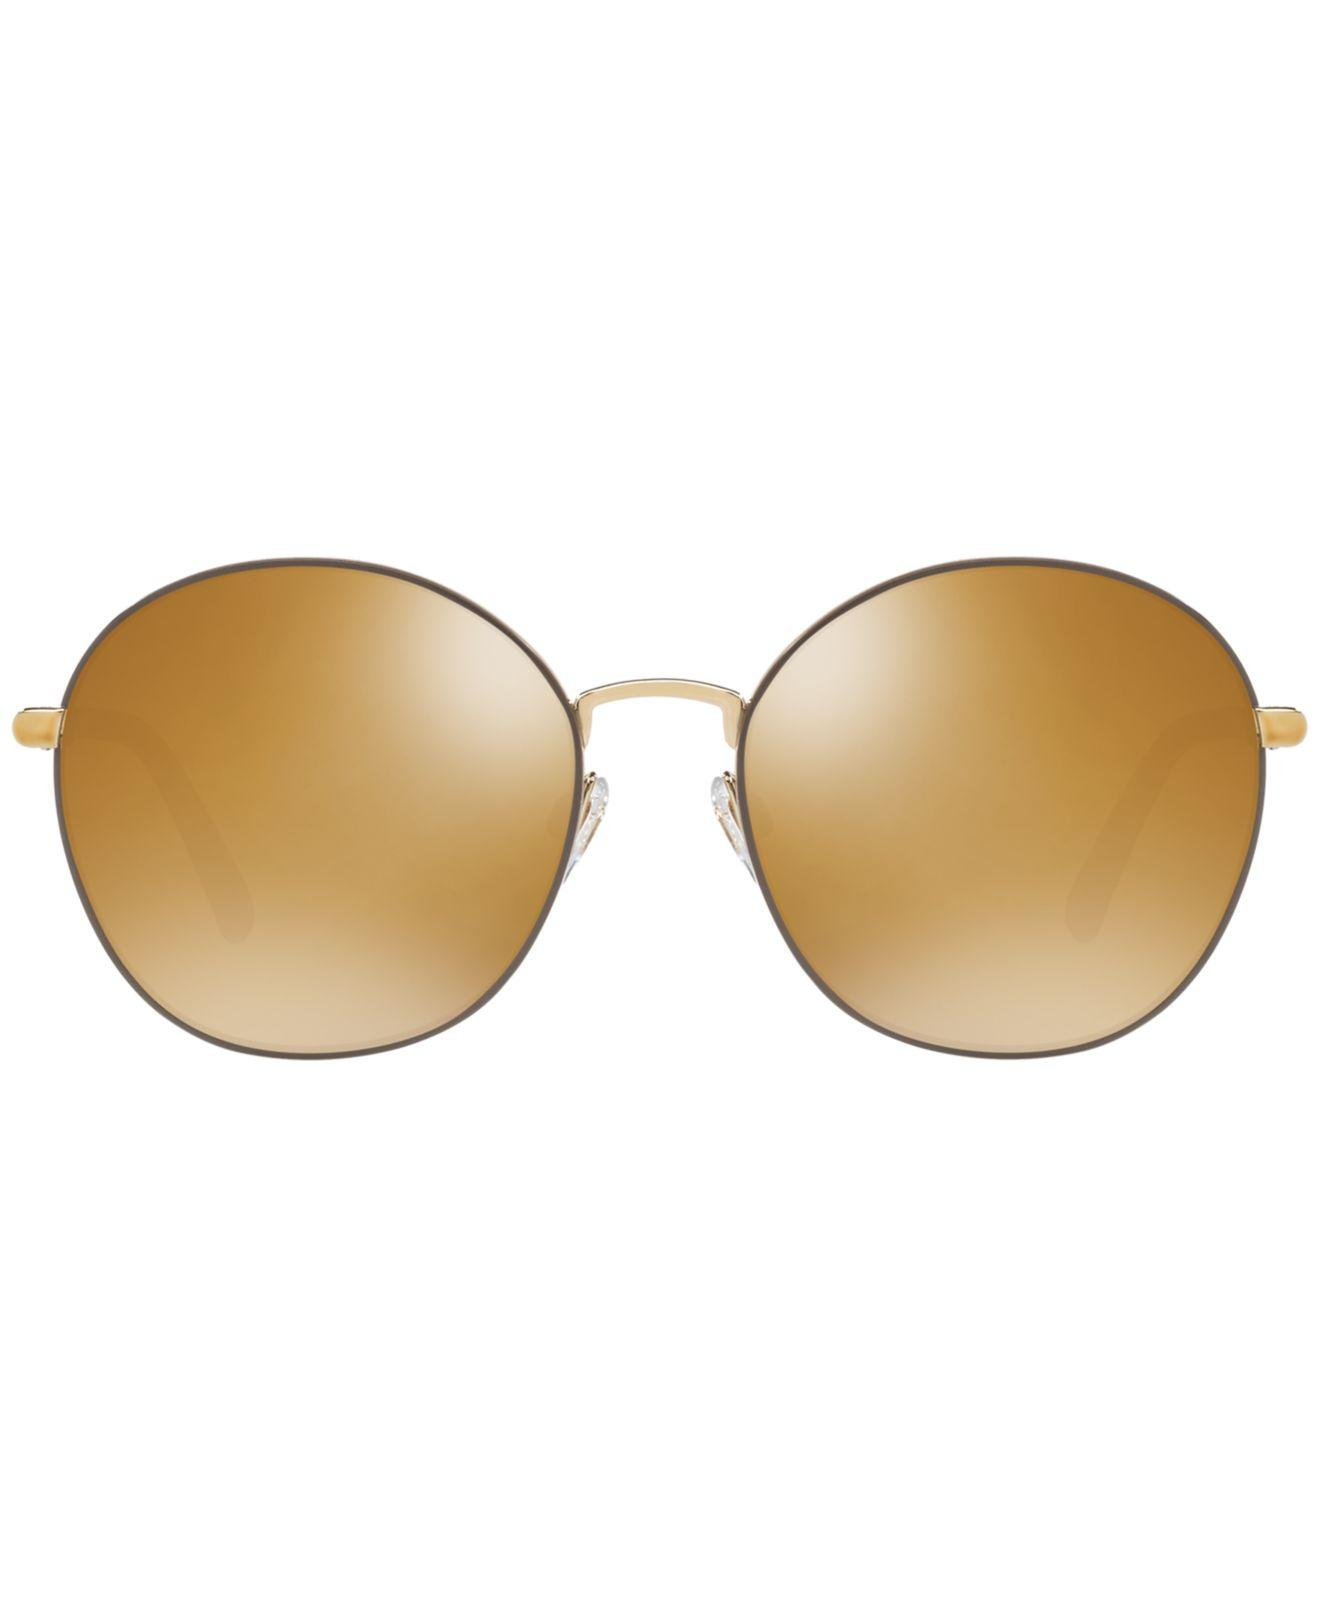 7e94d35fe931 Lyst - Burberry Polarized Sunglasses